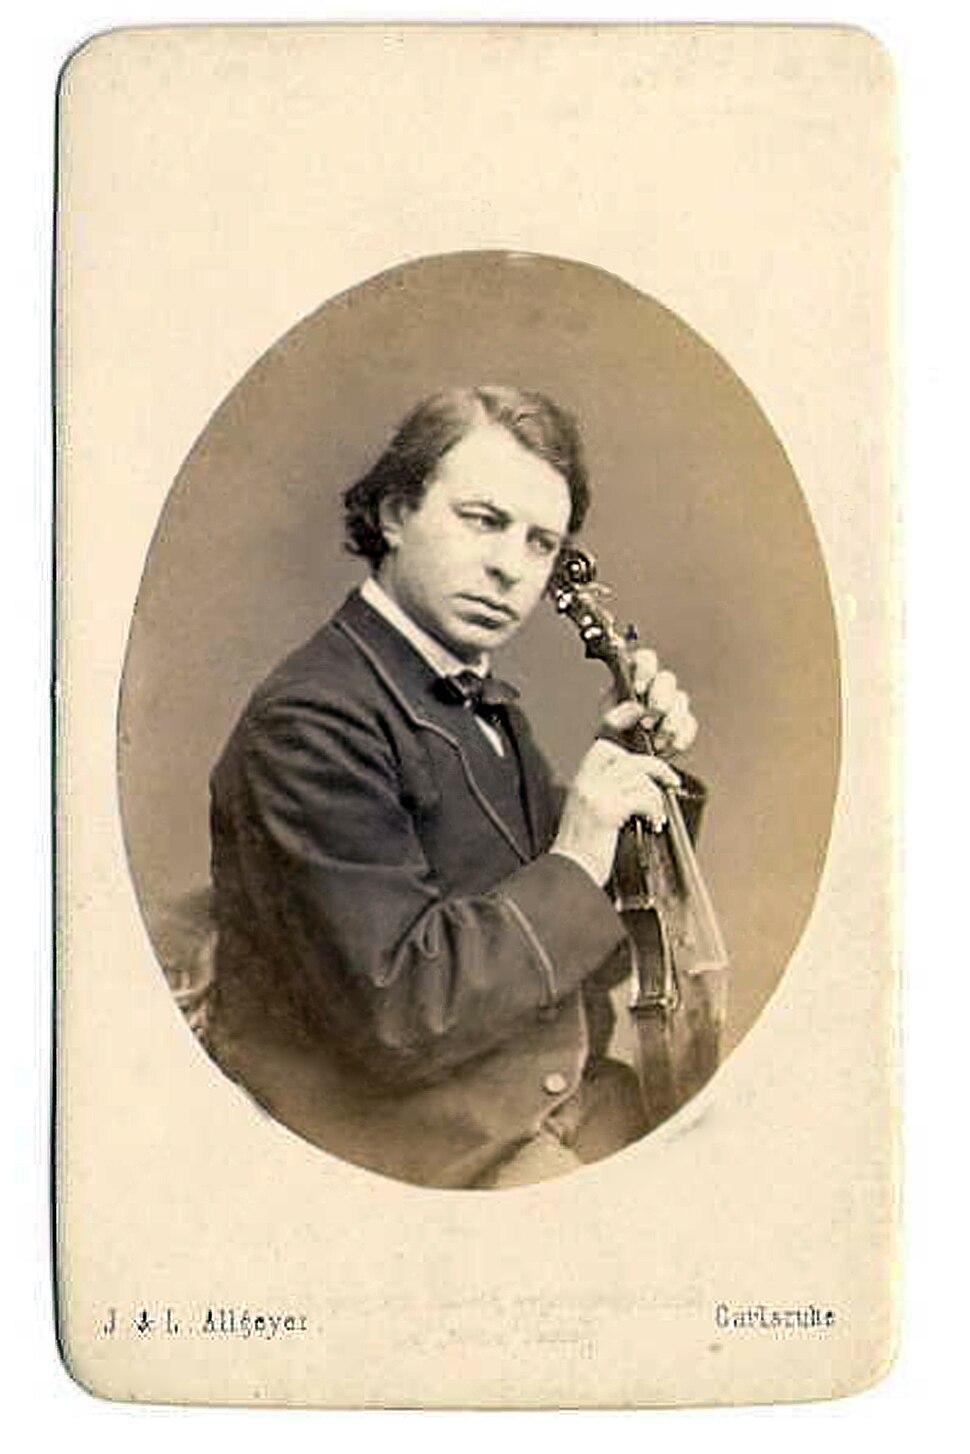 Joseph Joachim (photo by Julius Allgeyer)